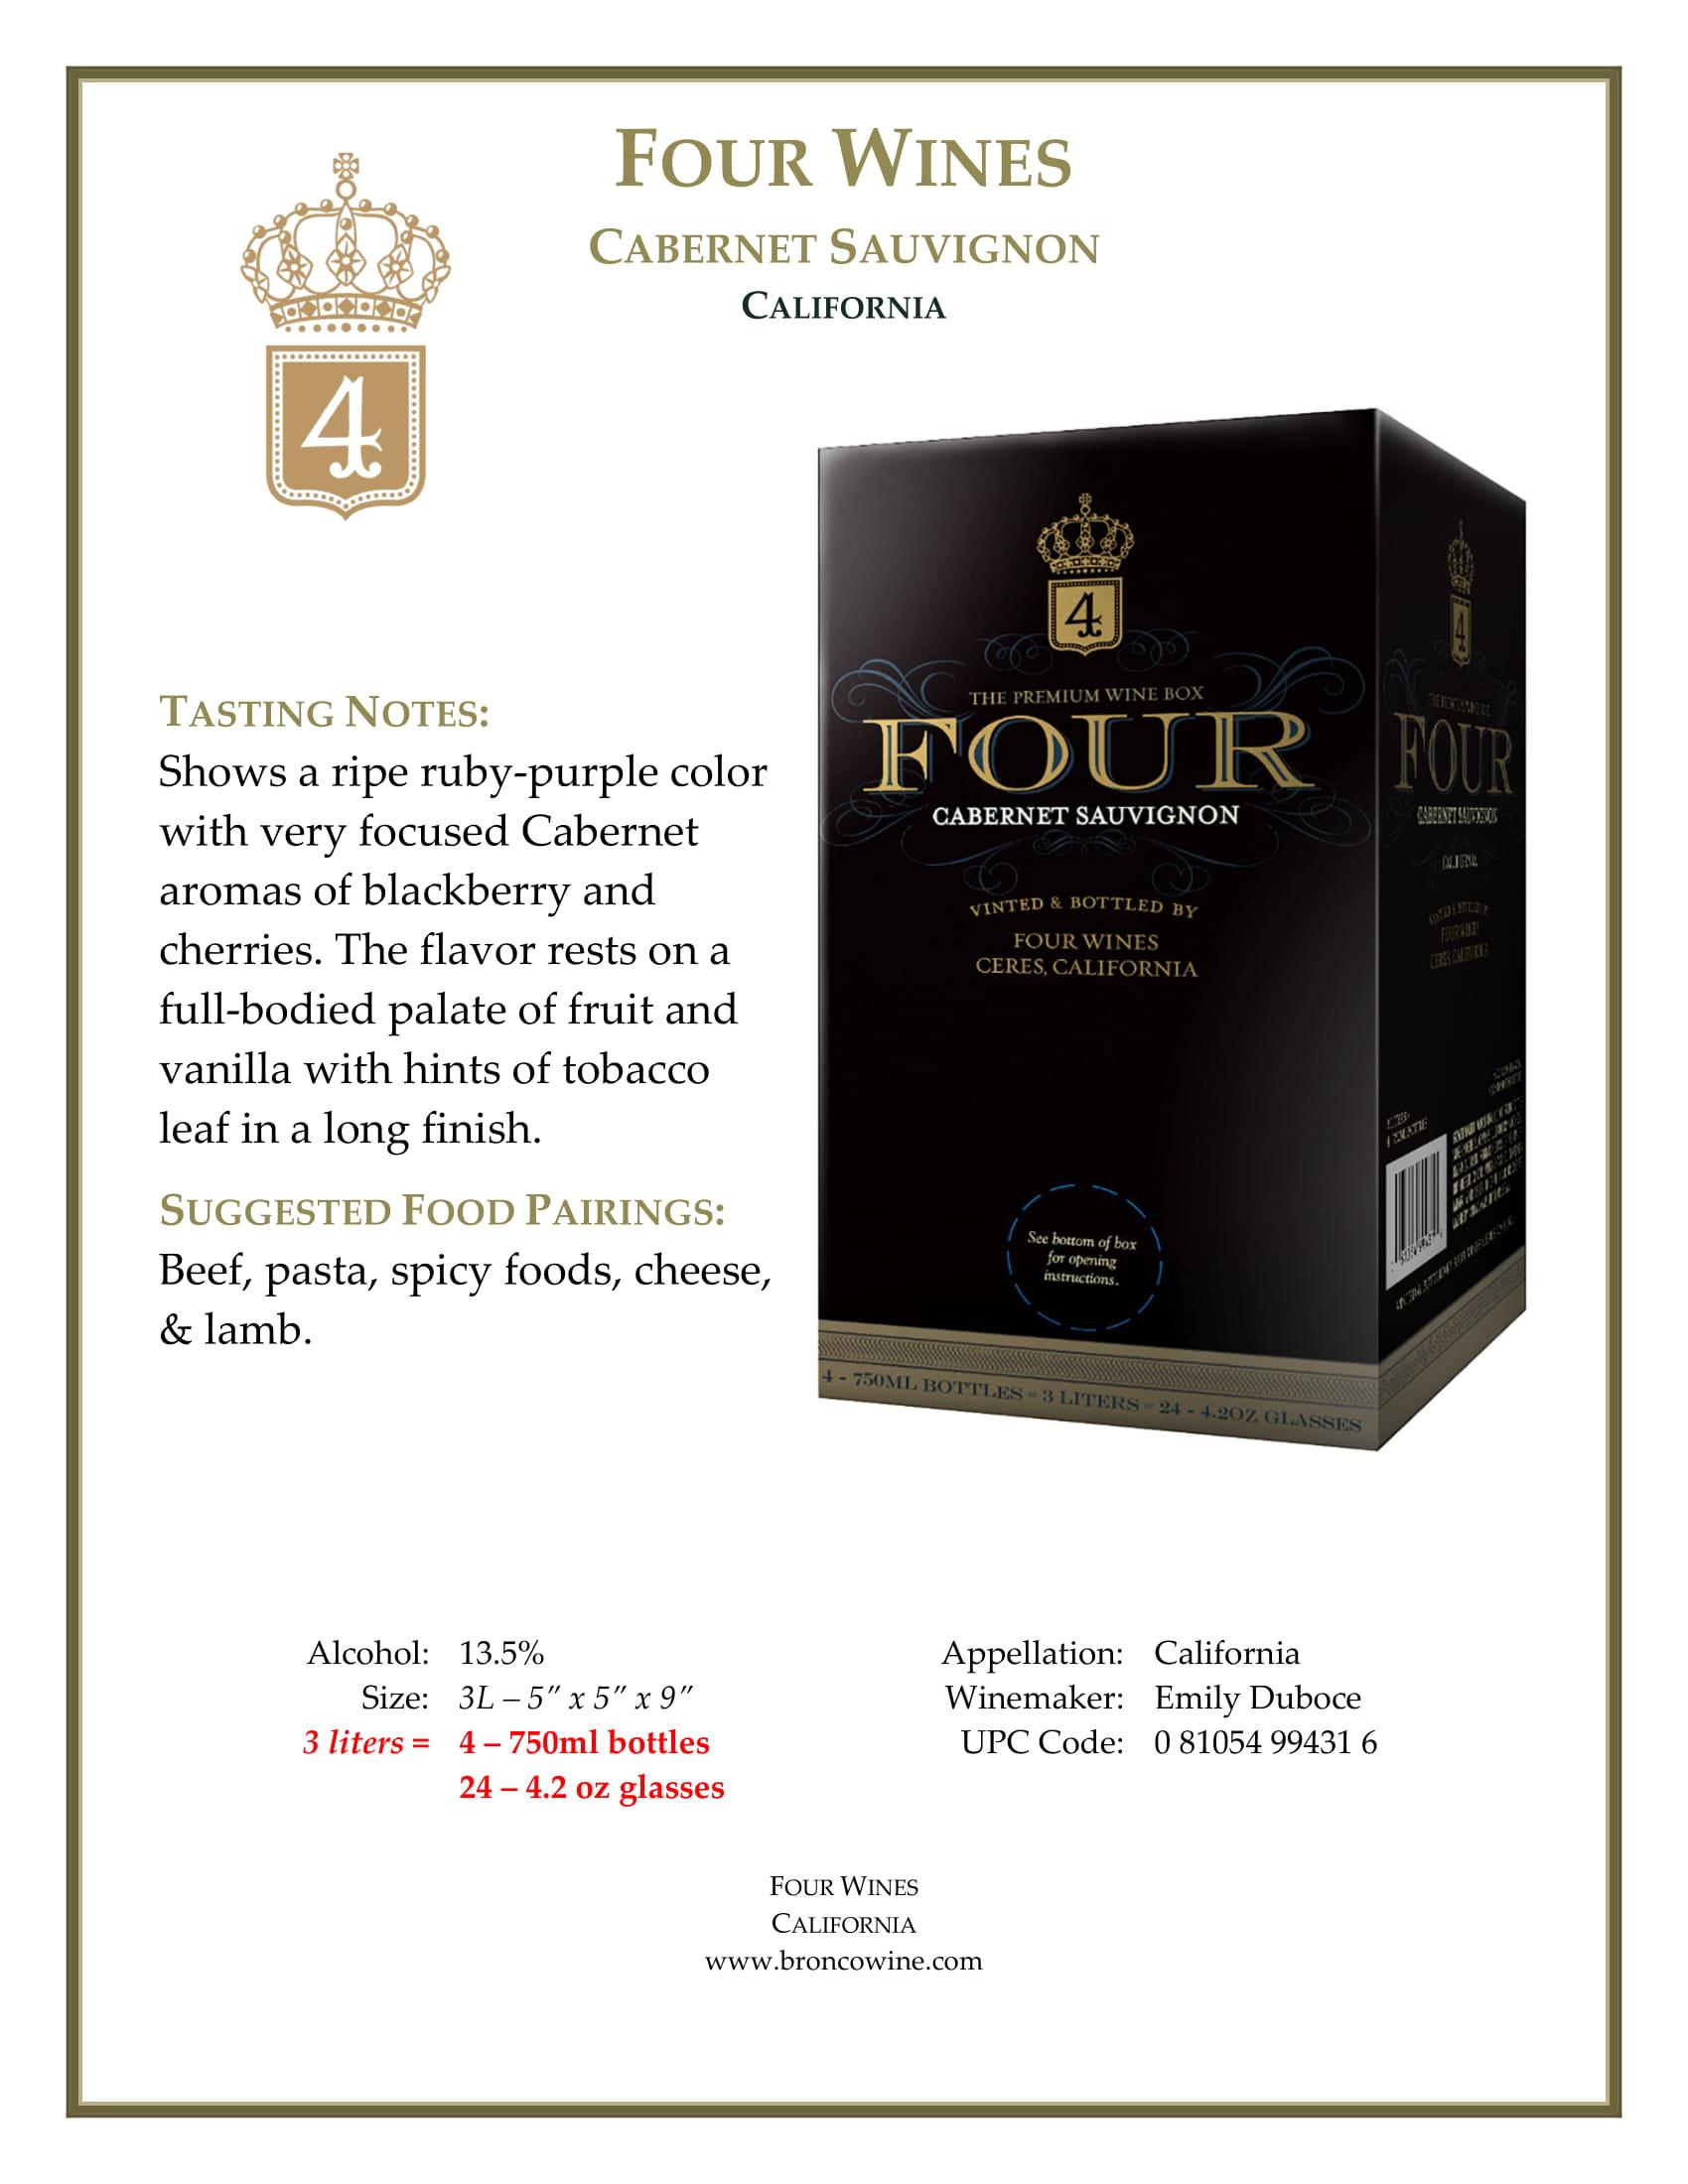 Four Wines Cabernet Sauvignon Box Tech Sheet